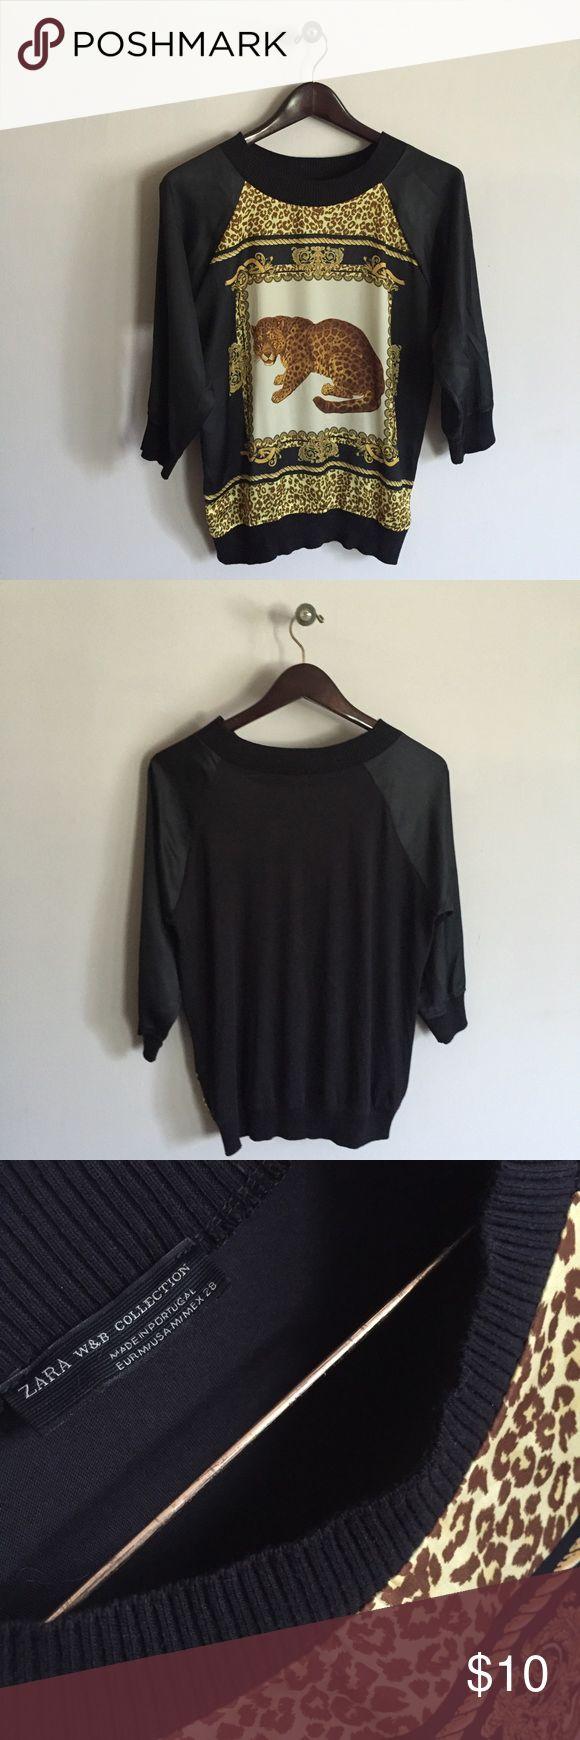 Zara women's leopard print shirt Great condition Zara Tops